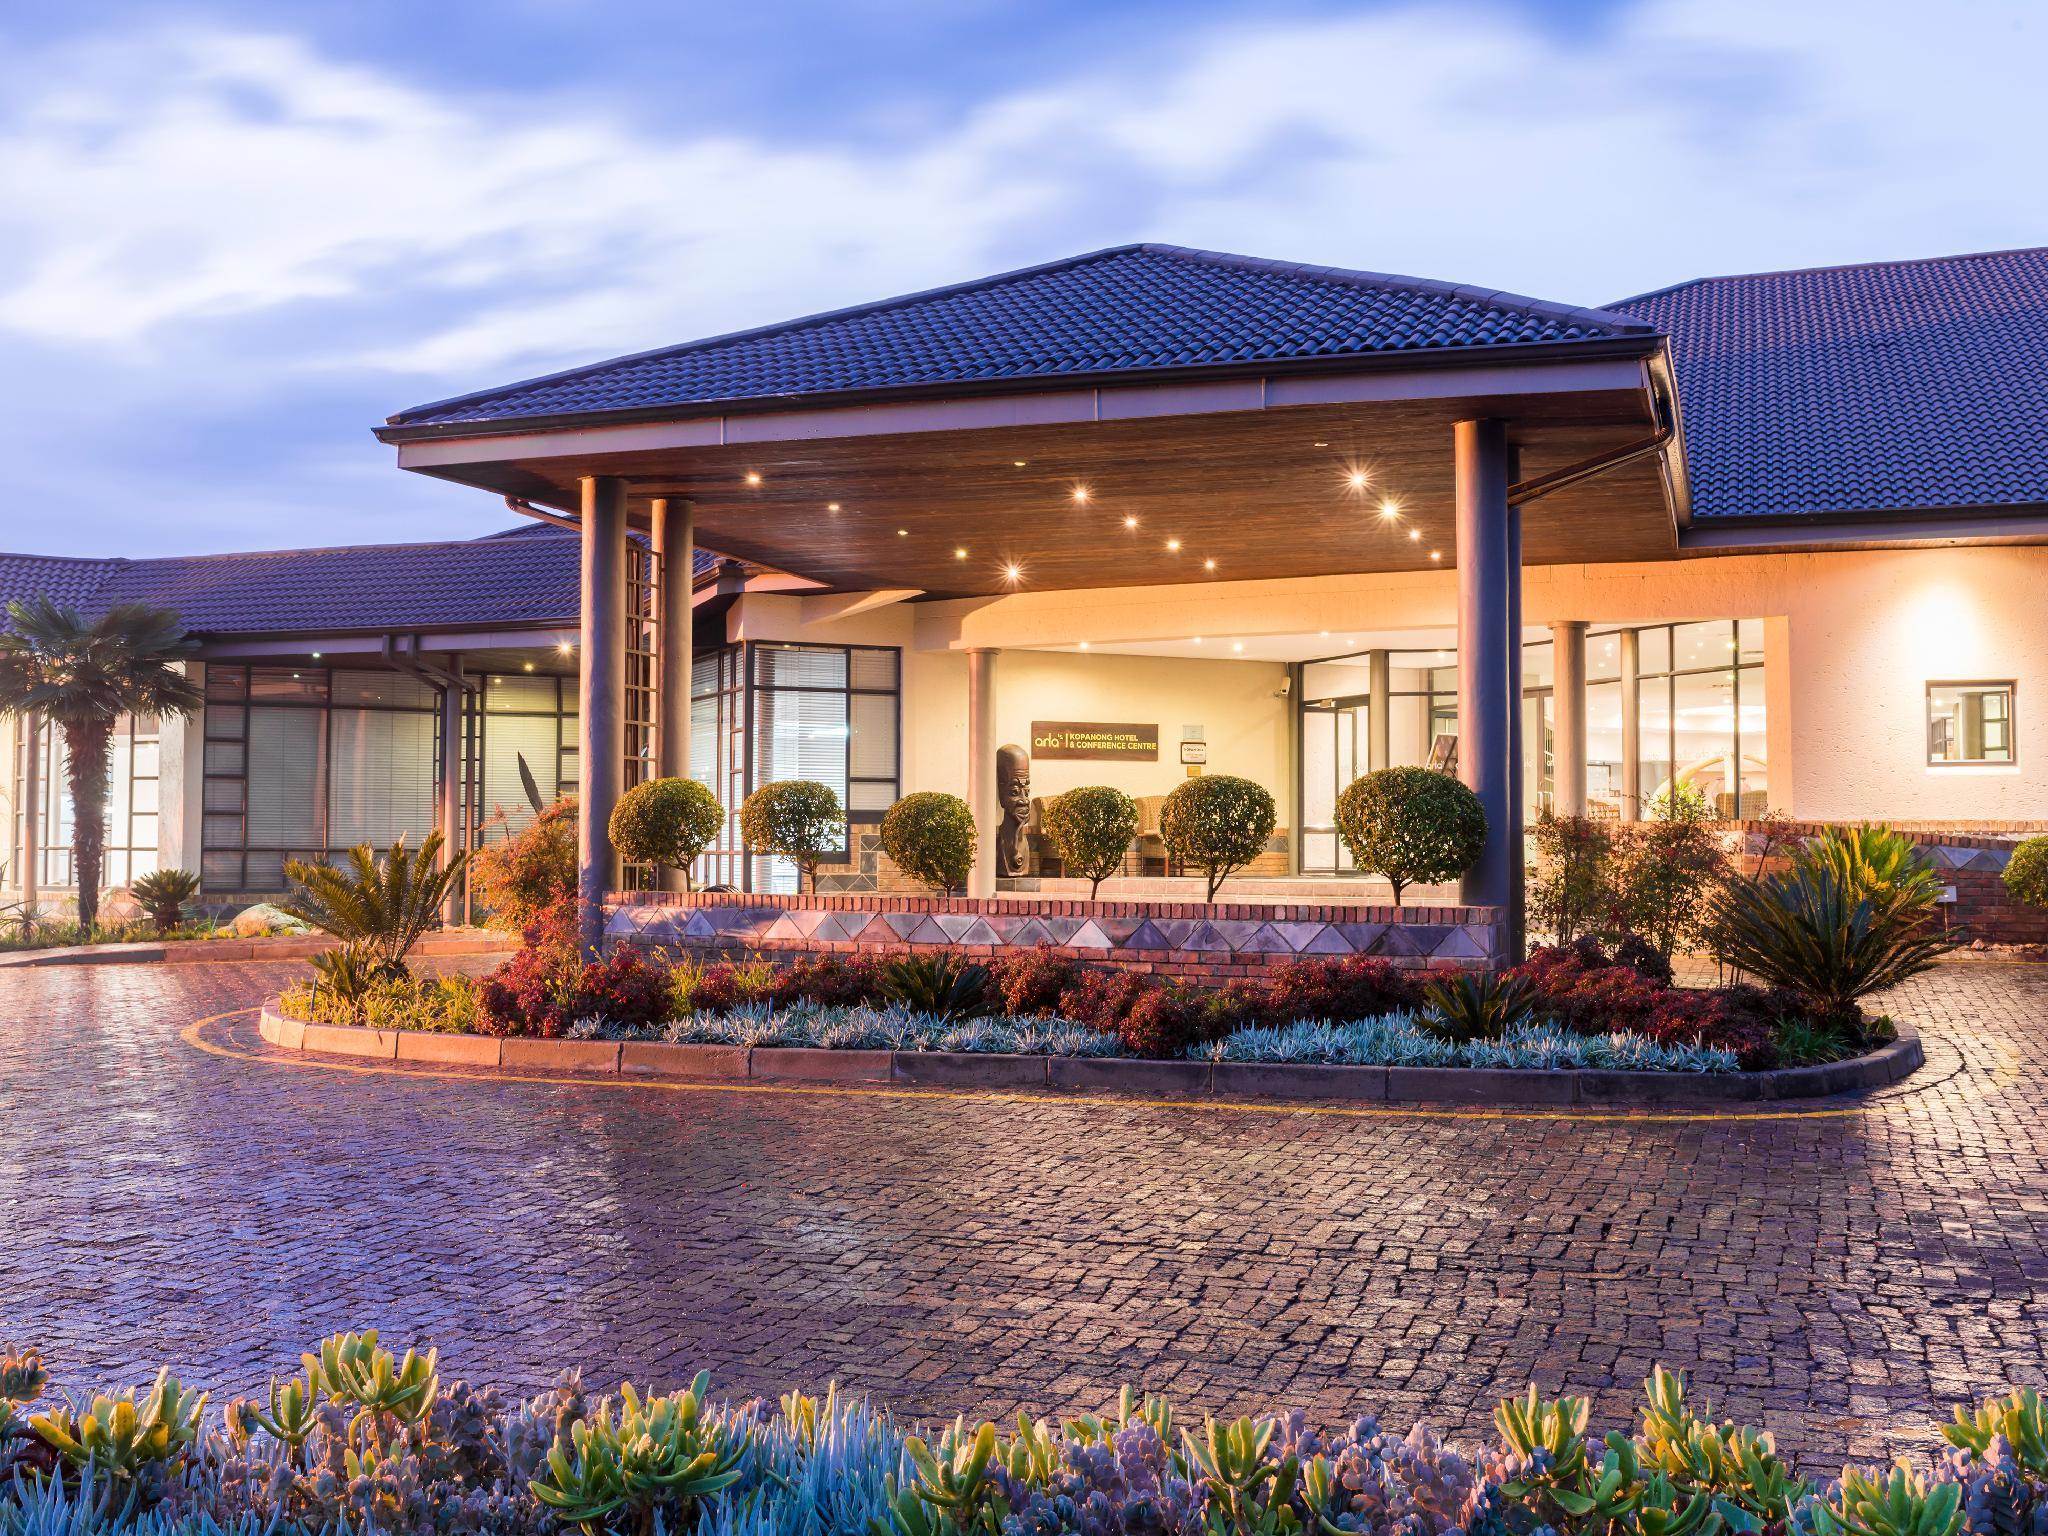 aha Kopanong Hotel & Conference Centre, Ekurhuleni